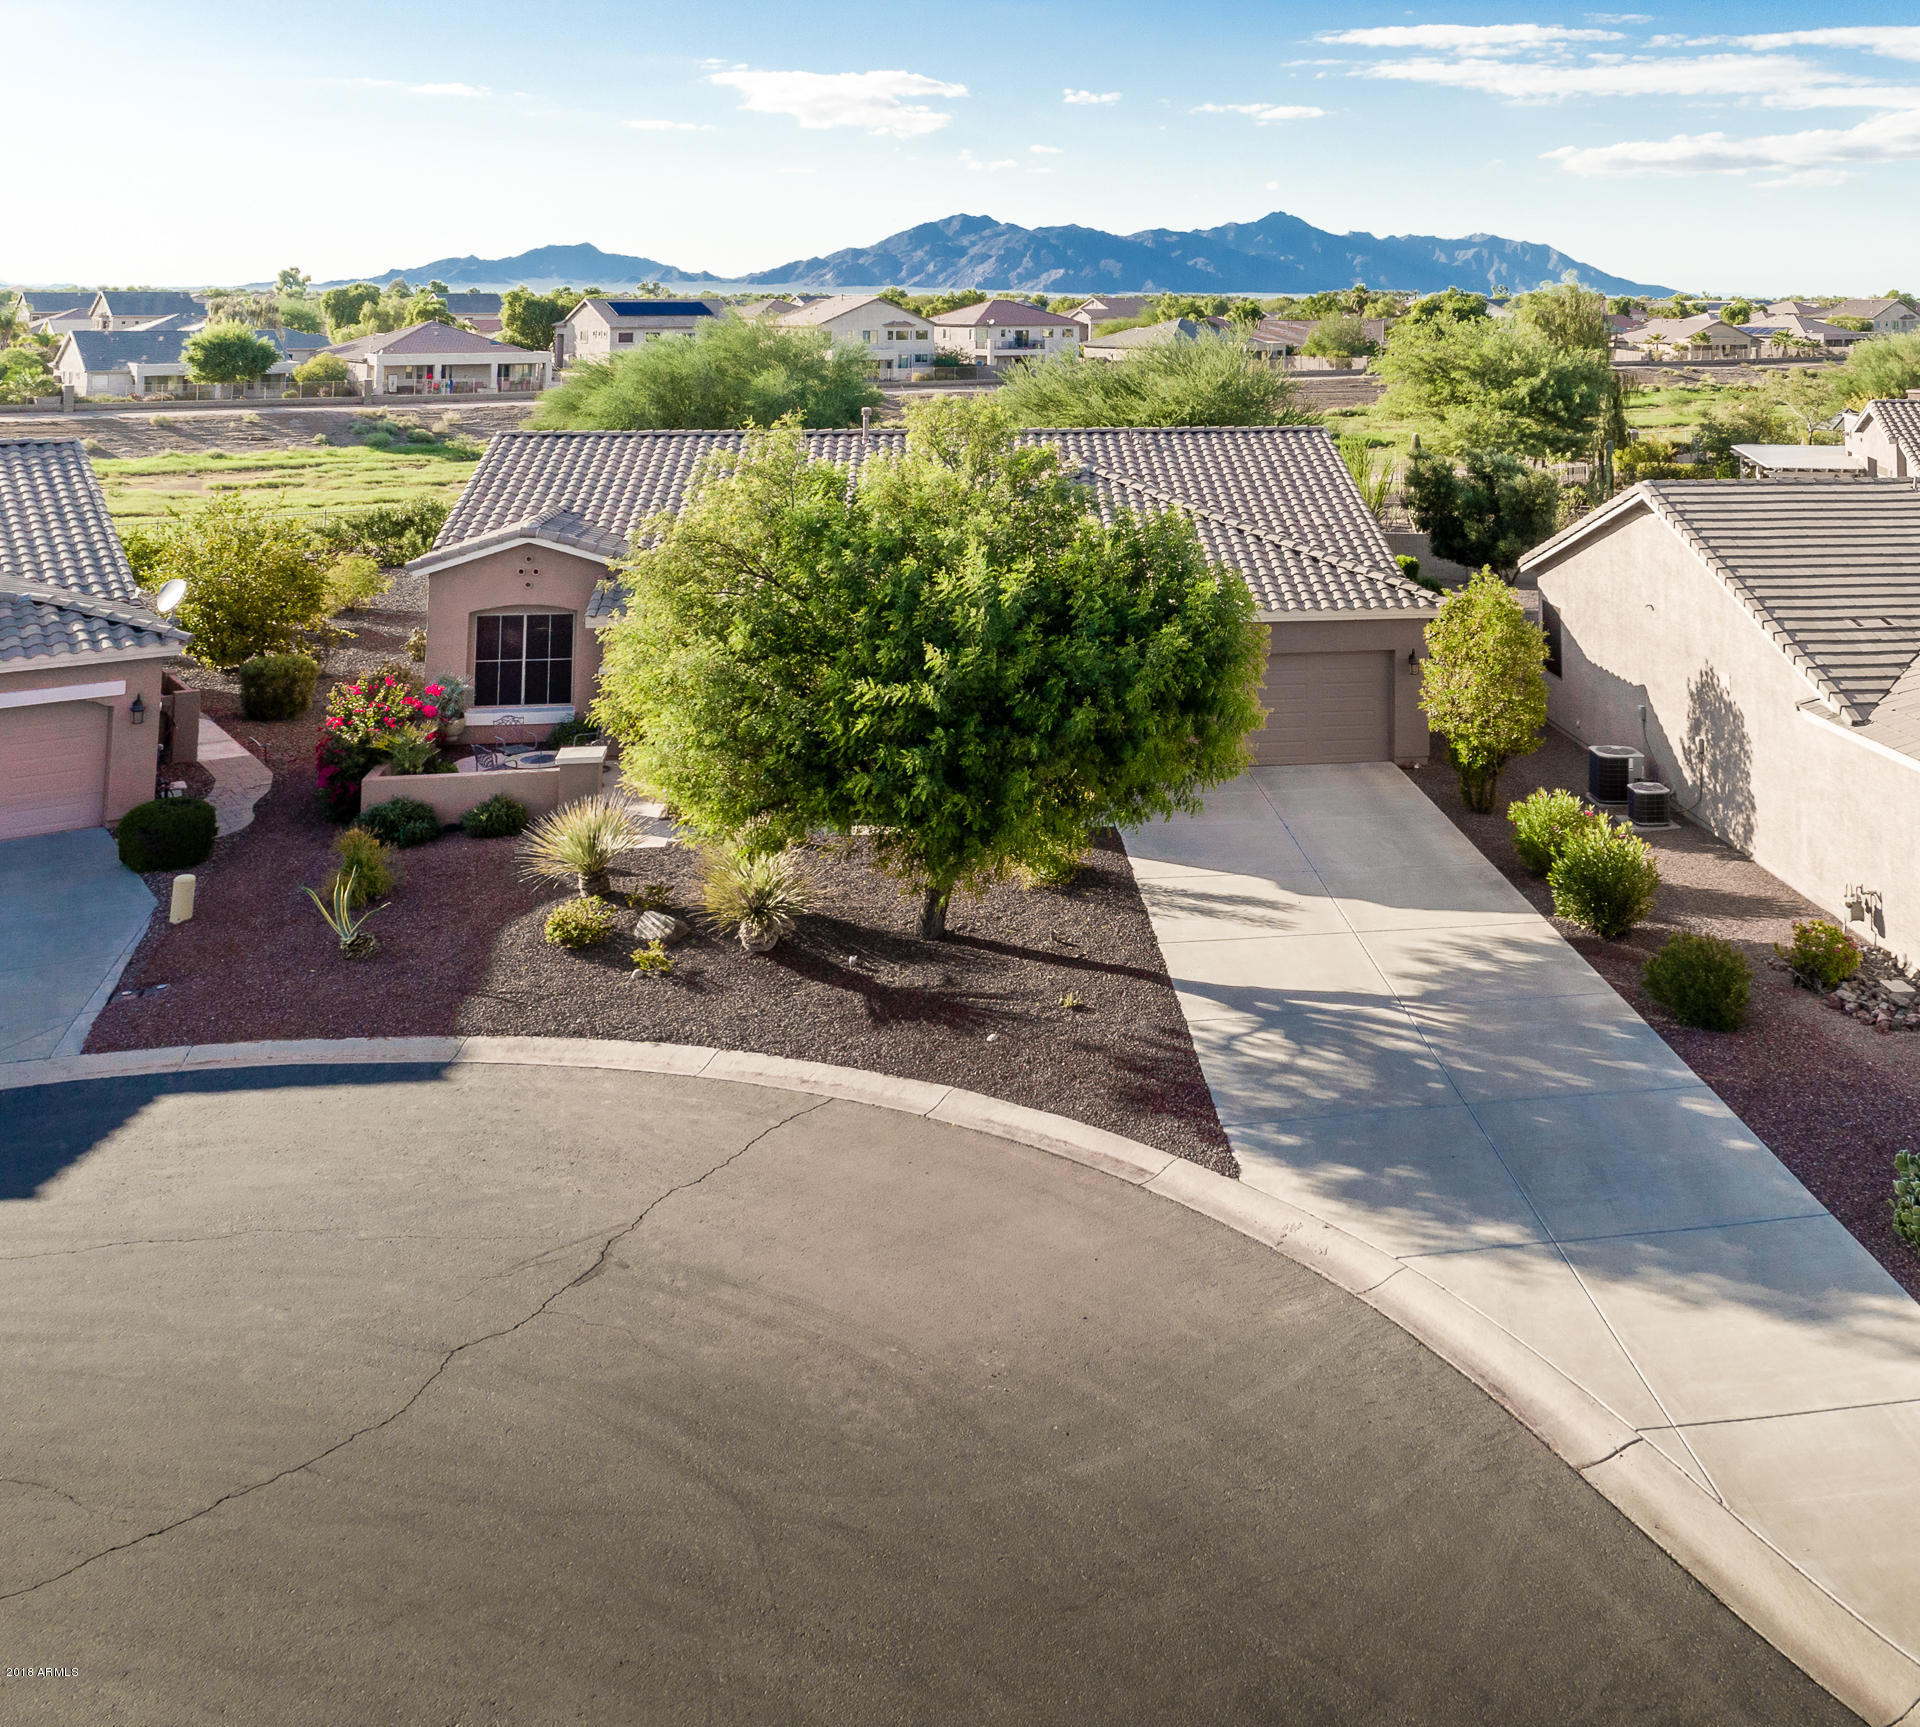 Photo for 42922 W Castle Cove Circle, Maricopa, AZ 85138 (MLS # 5837299)